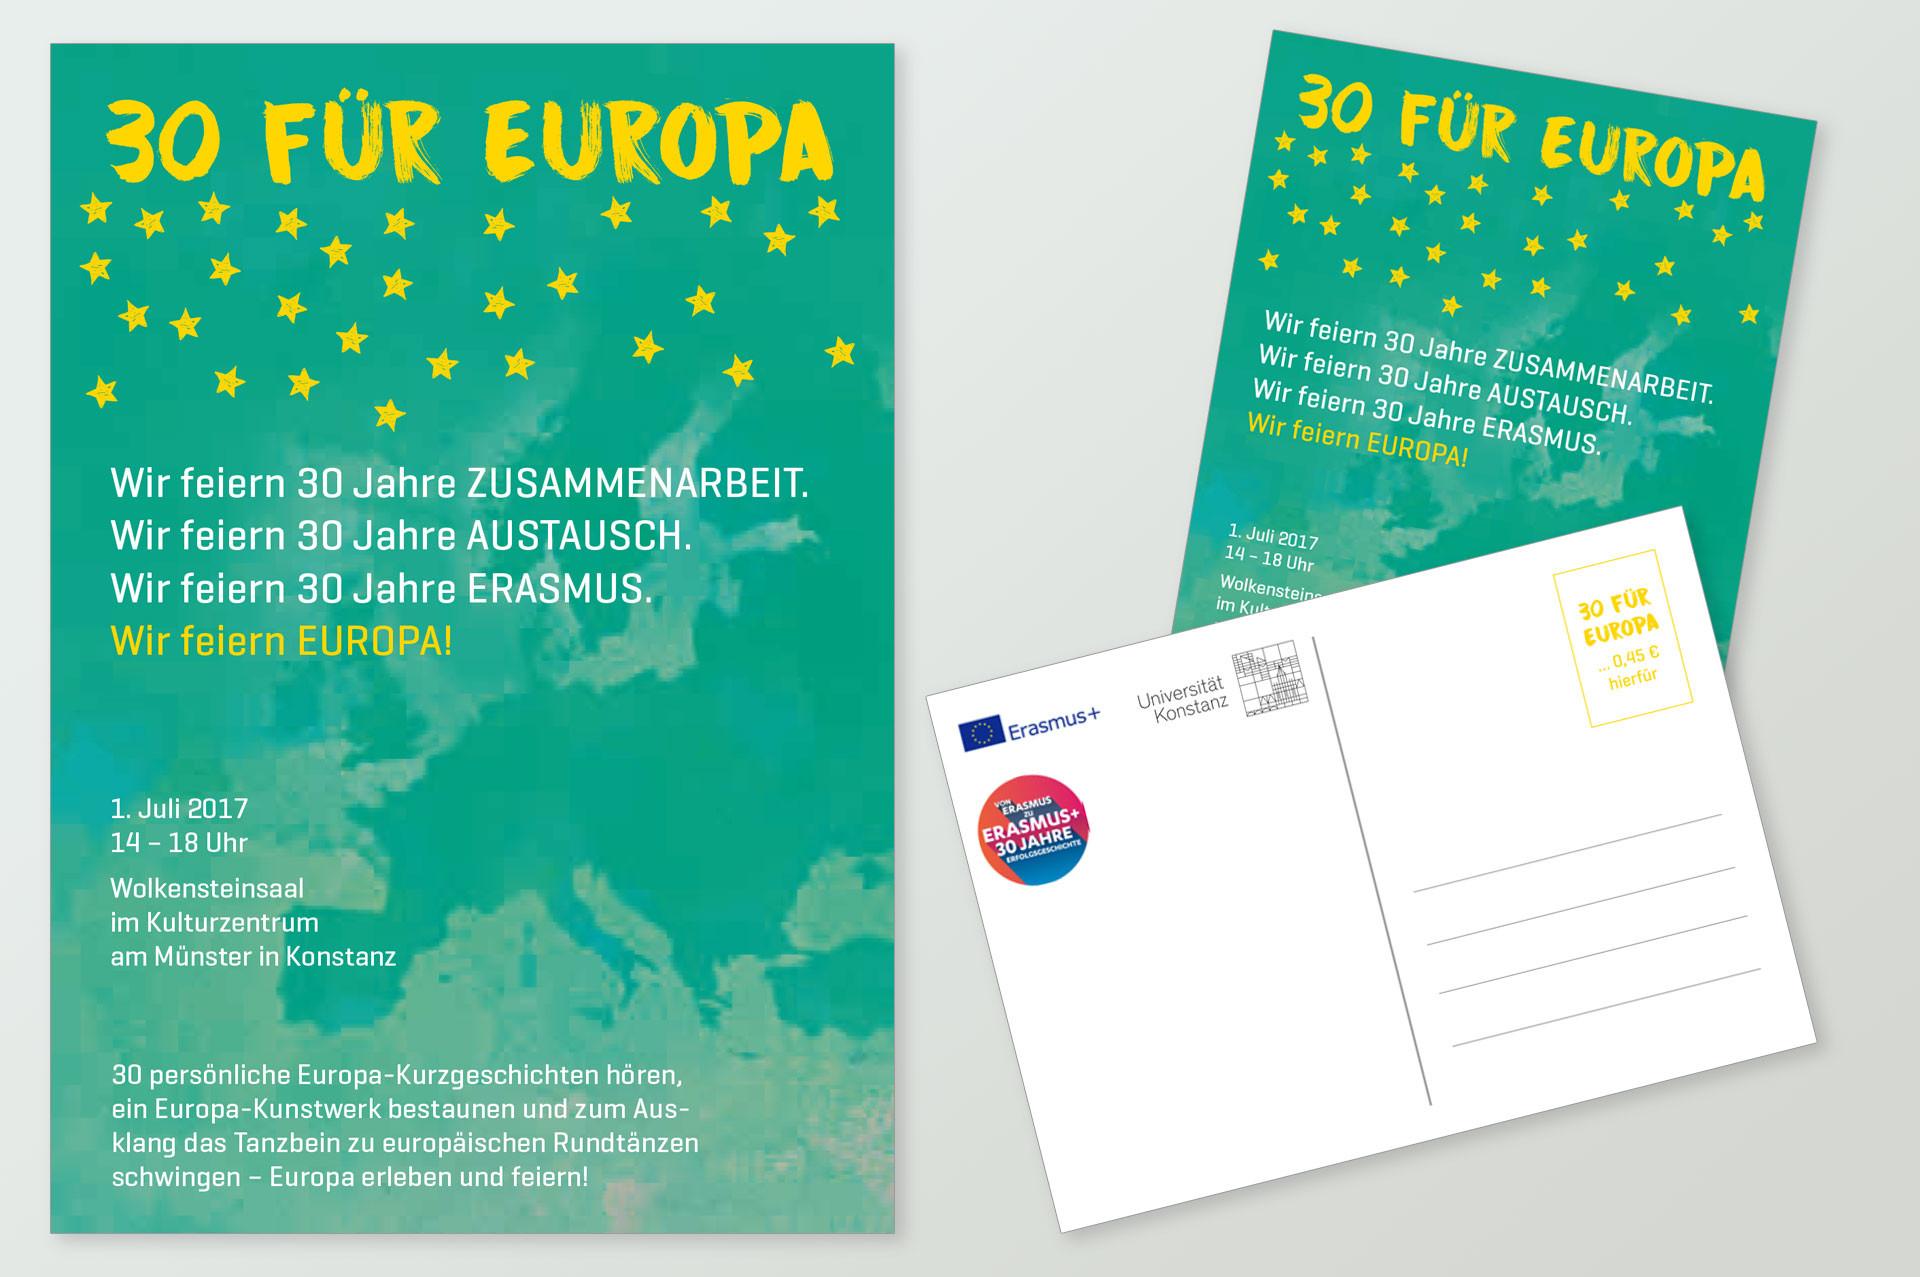 UKN_Erasmus.jpg